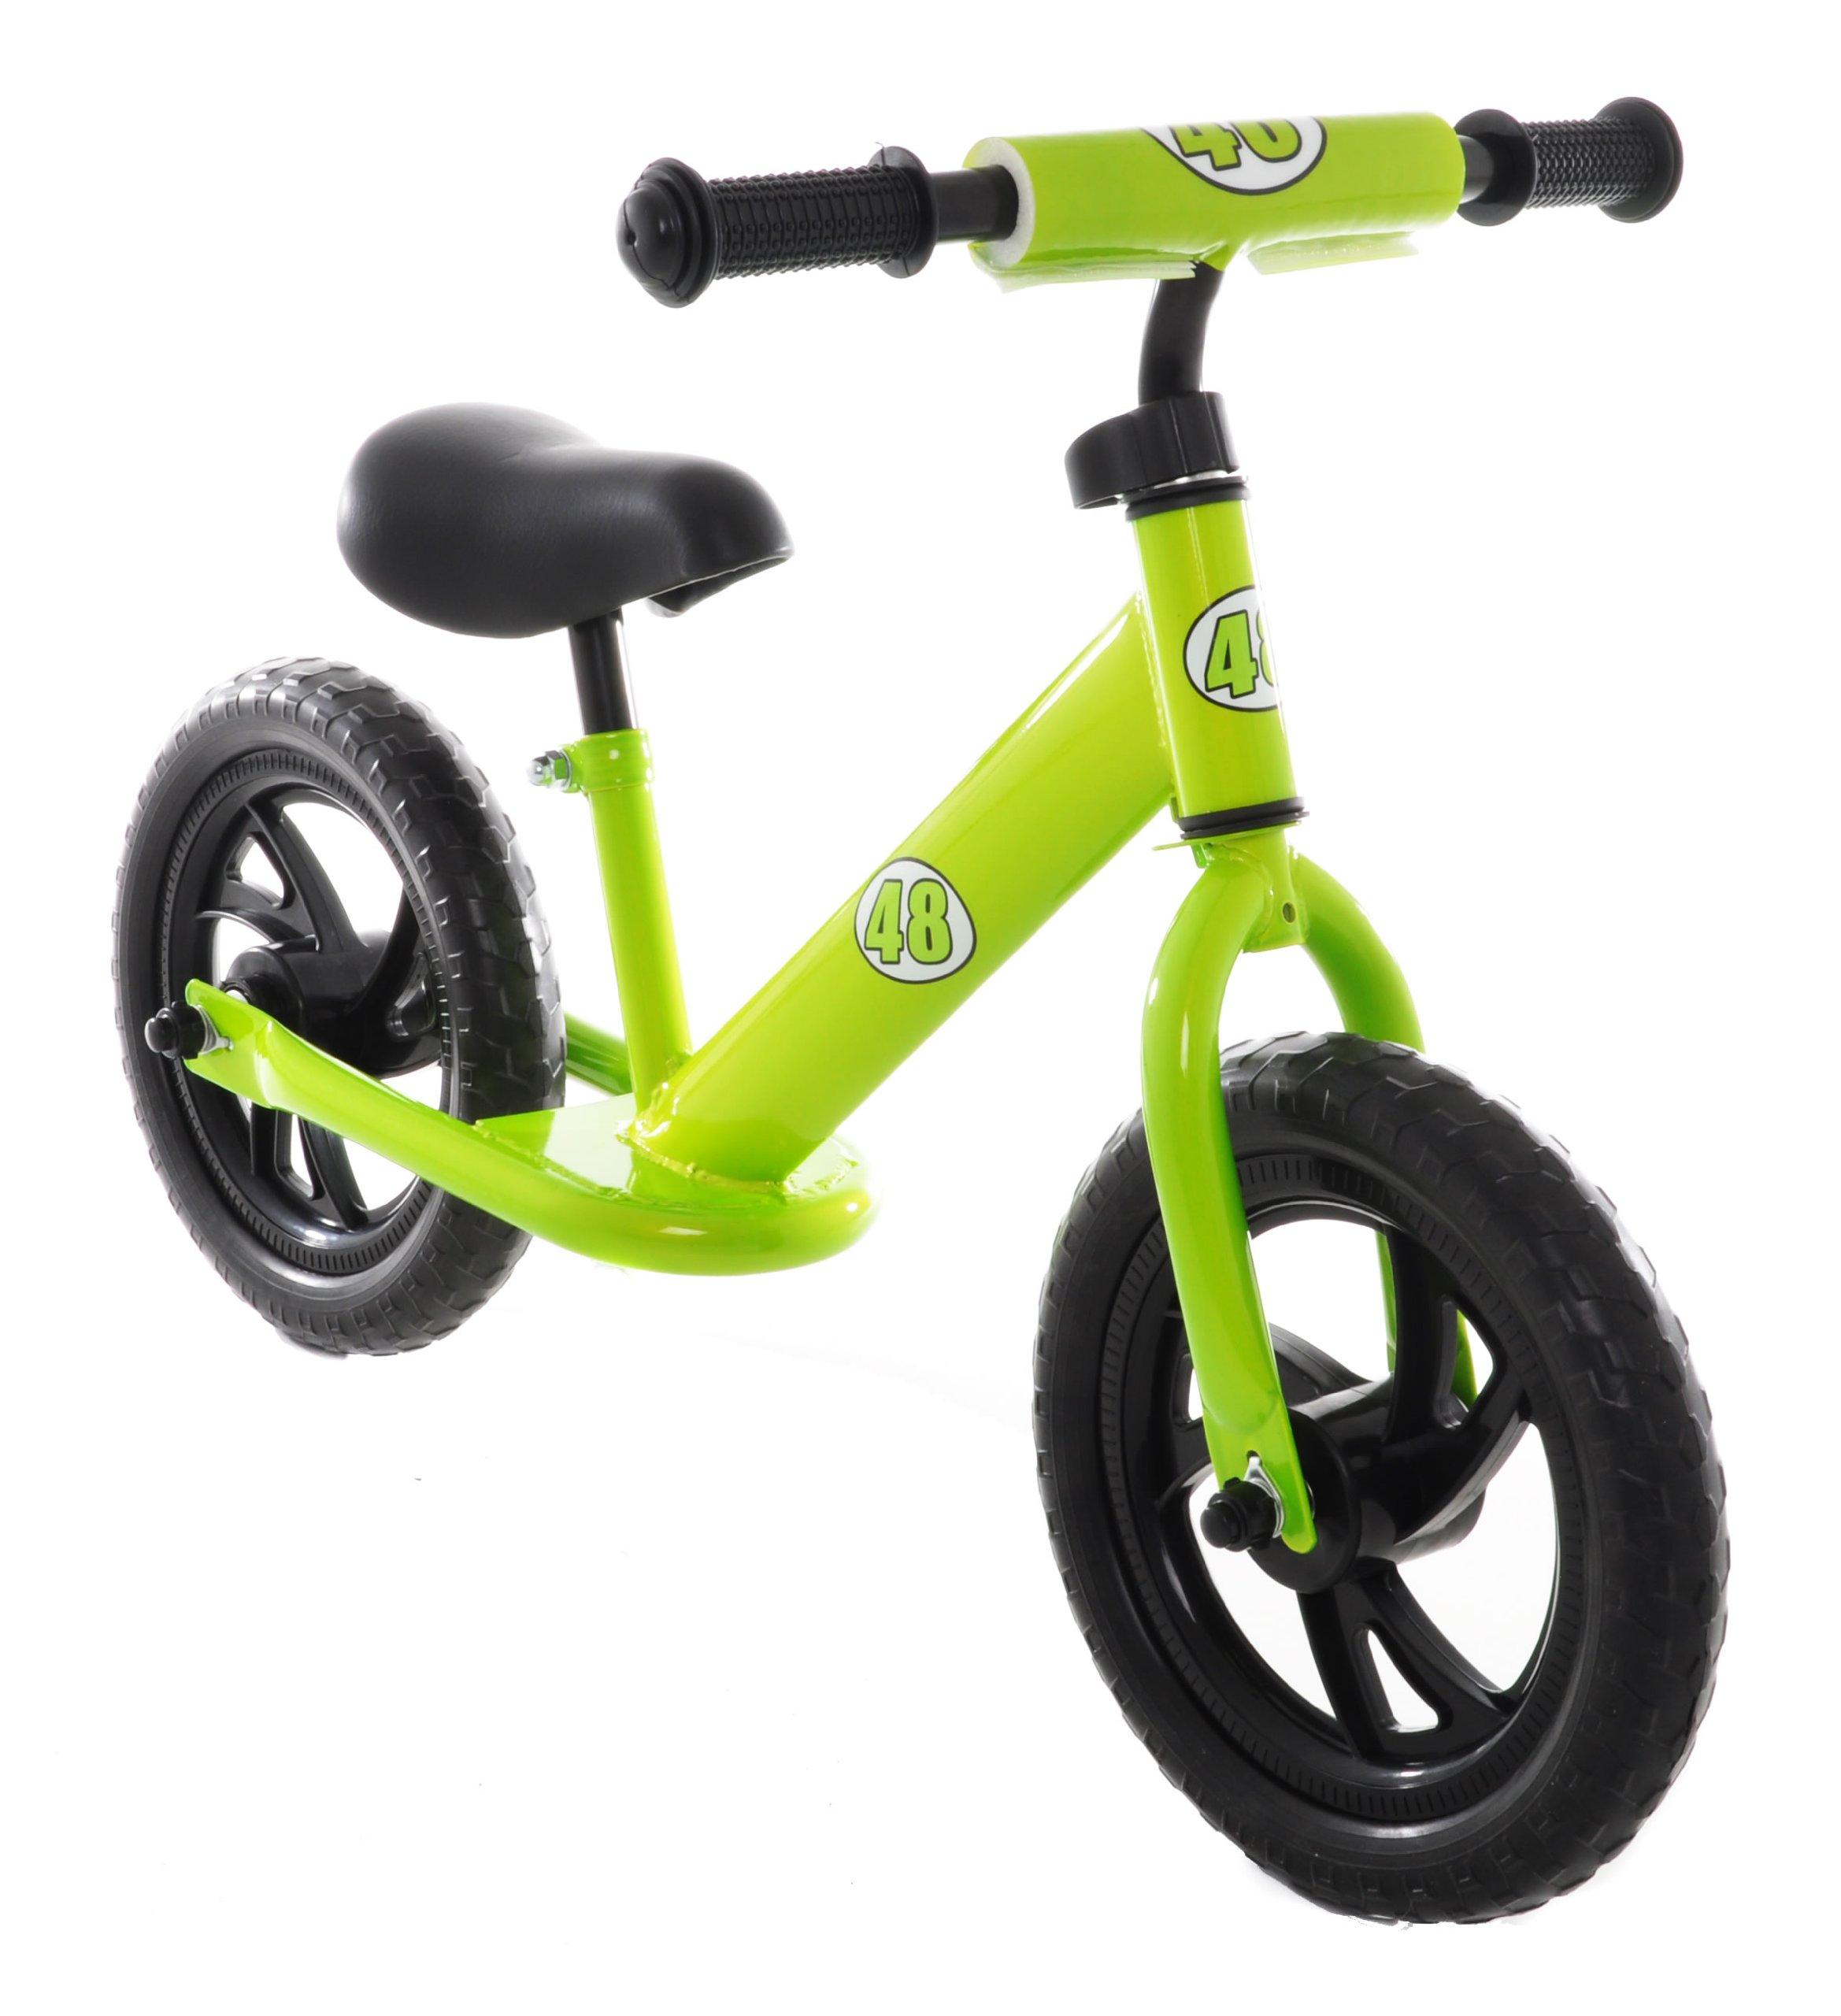 Vilano Rally Balance Bike Training No Pedal Push Bicycle, Green